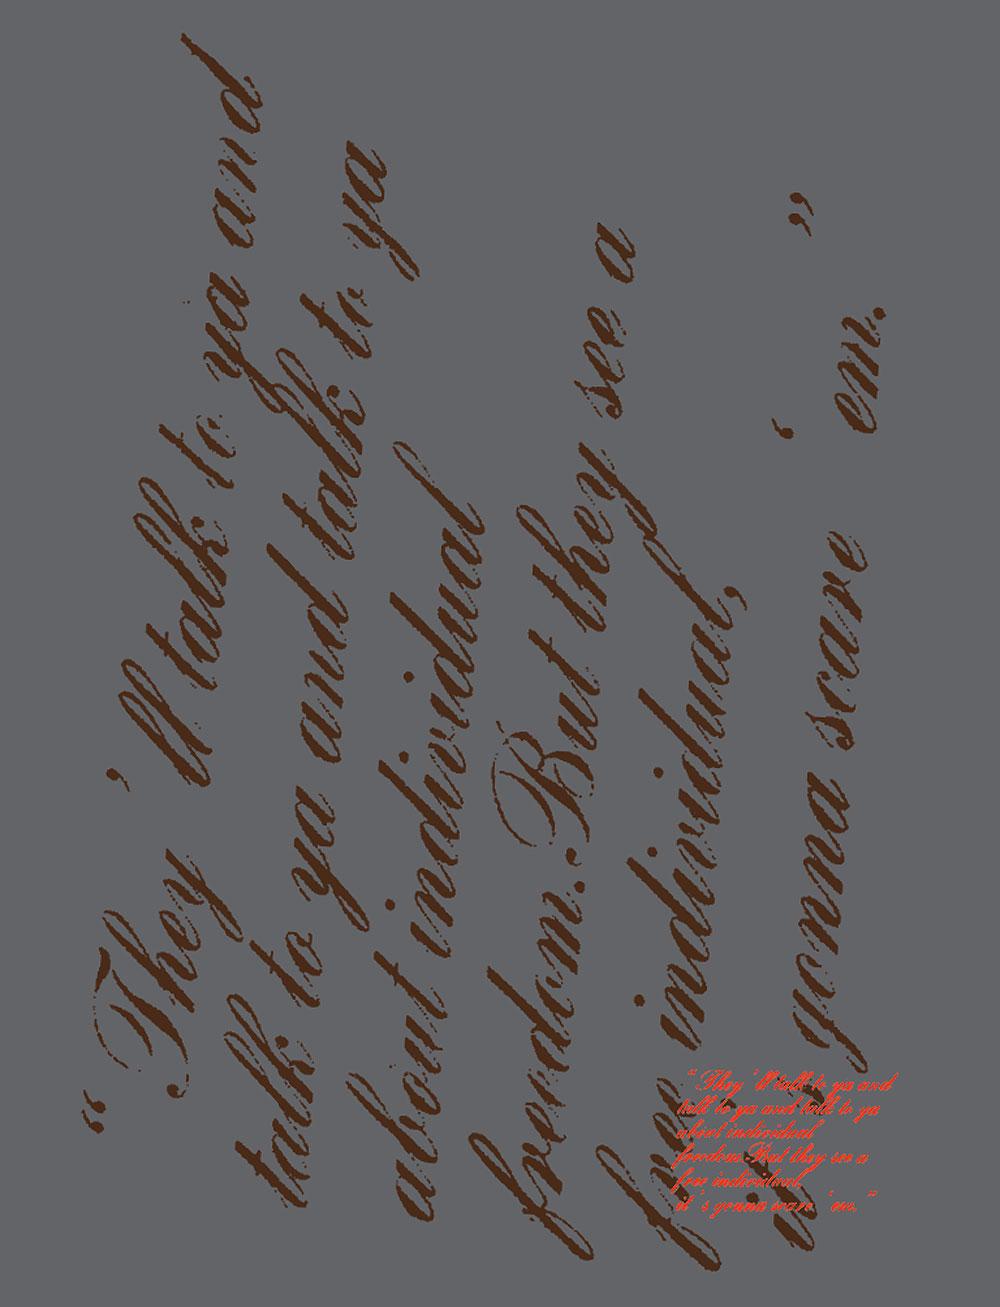 easy-rider-text-slate.jpg